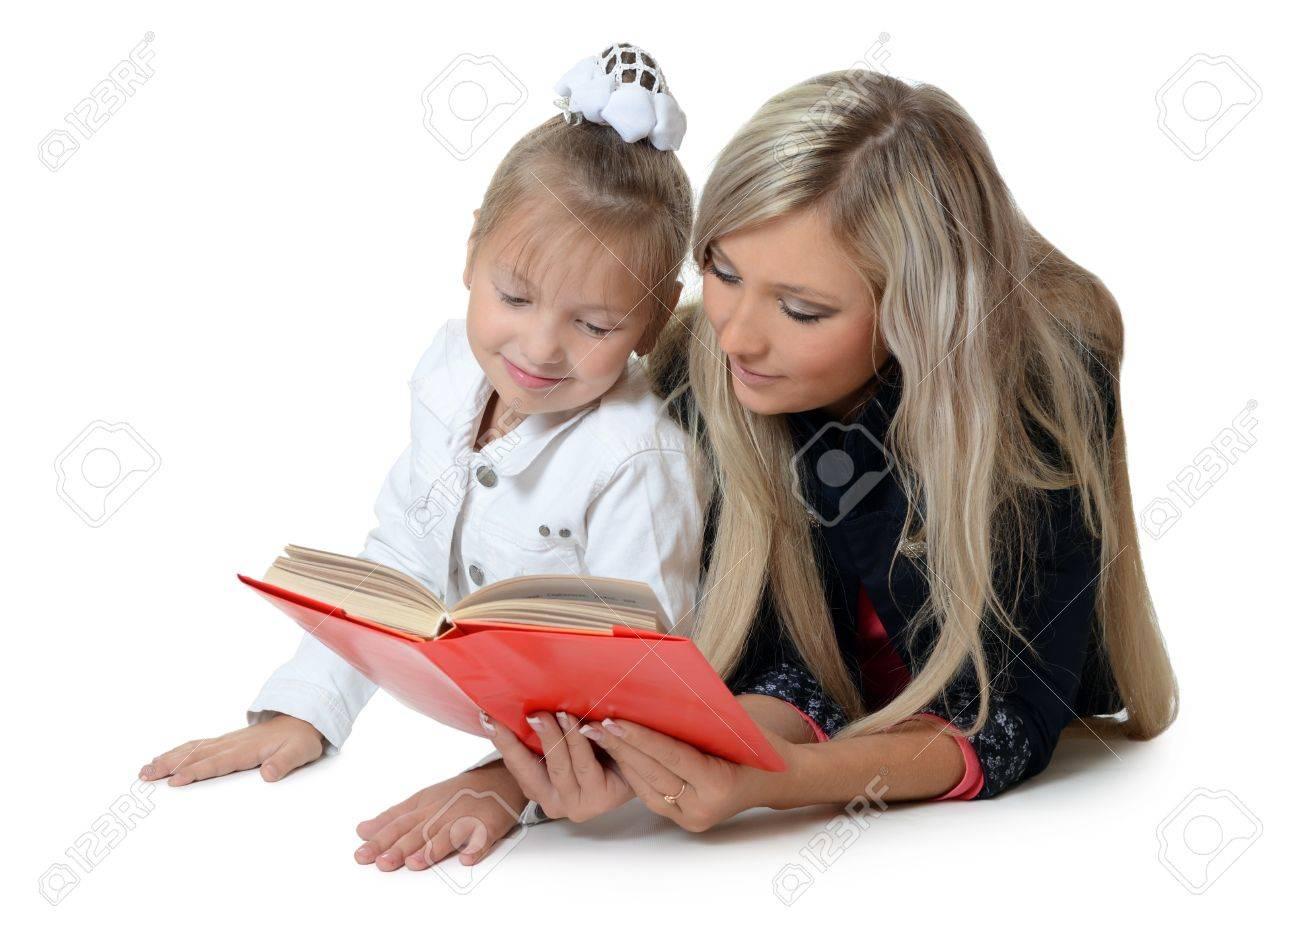 Мама и дочка онлайн 26 фотография